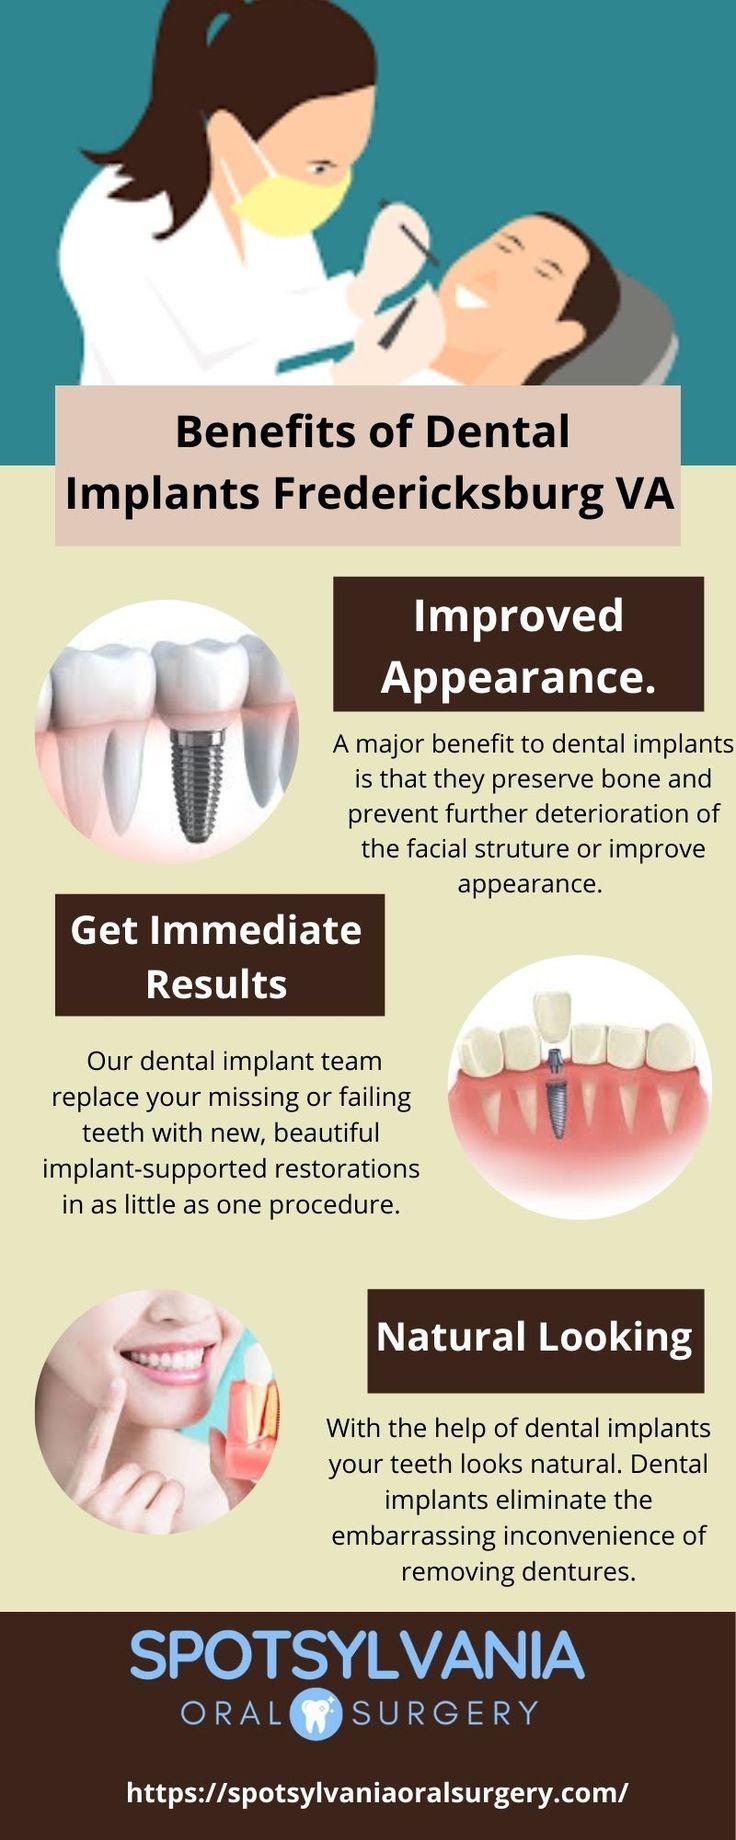 Benefits of dental implants fredericksburg va